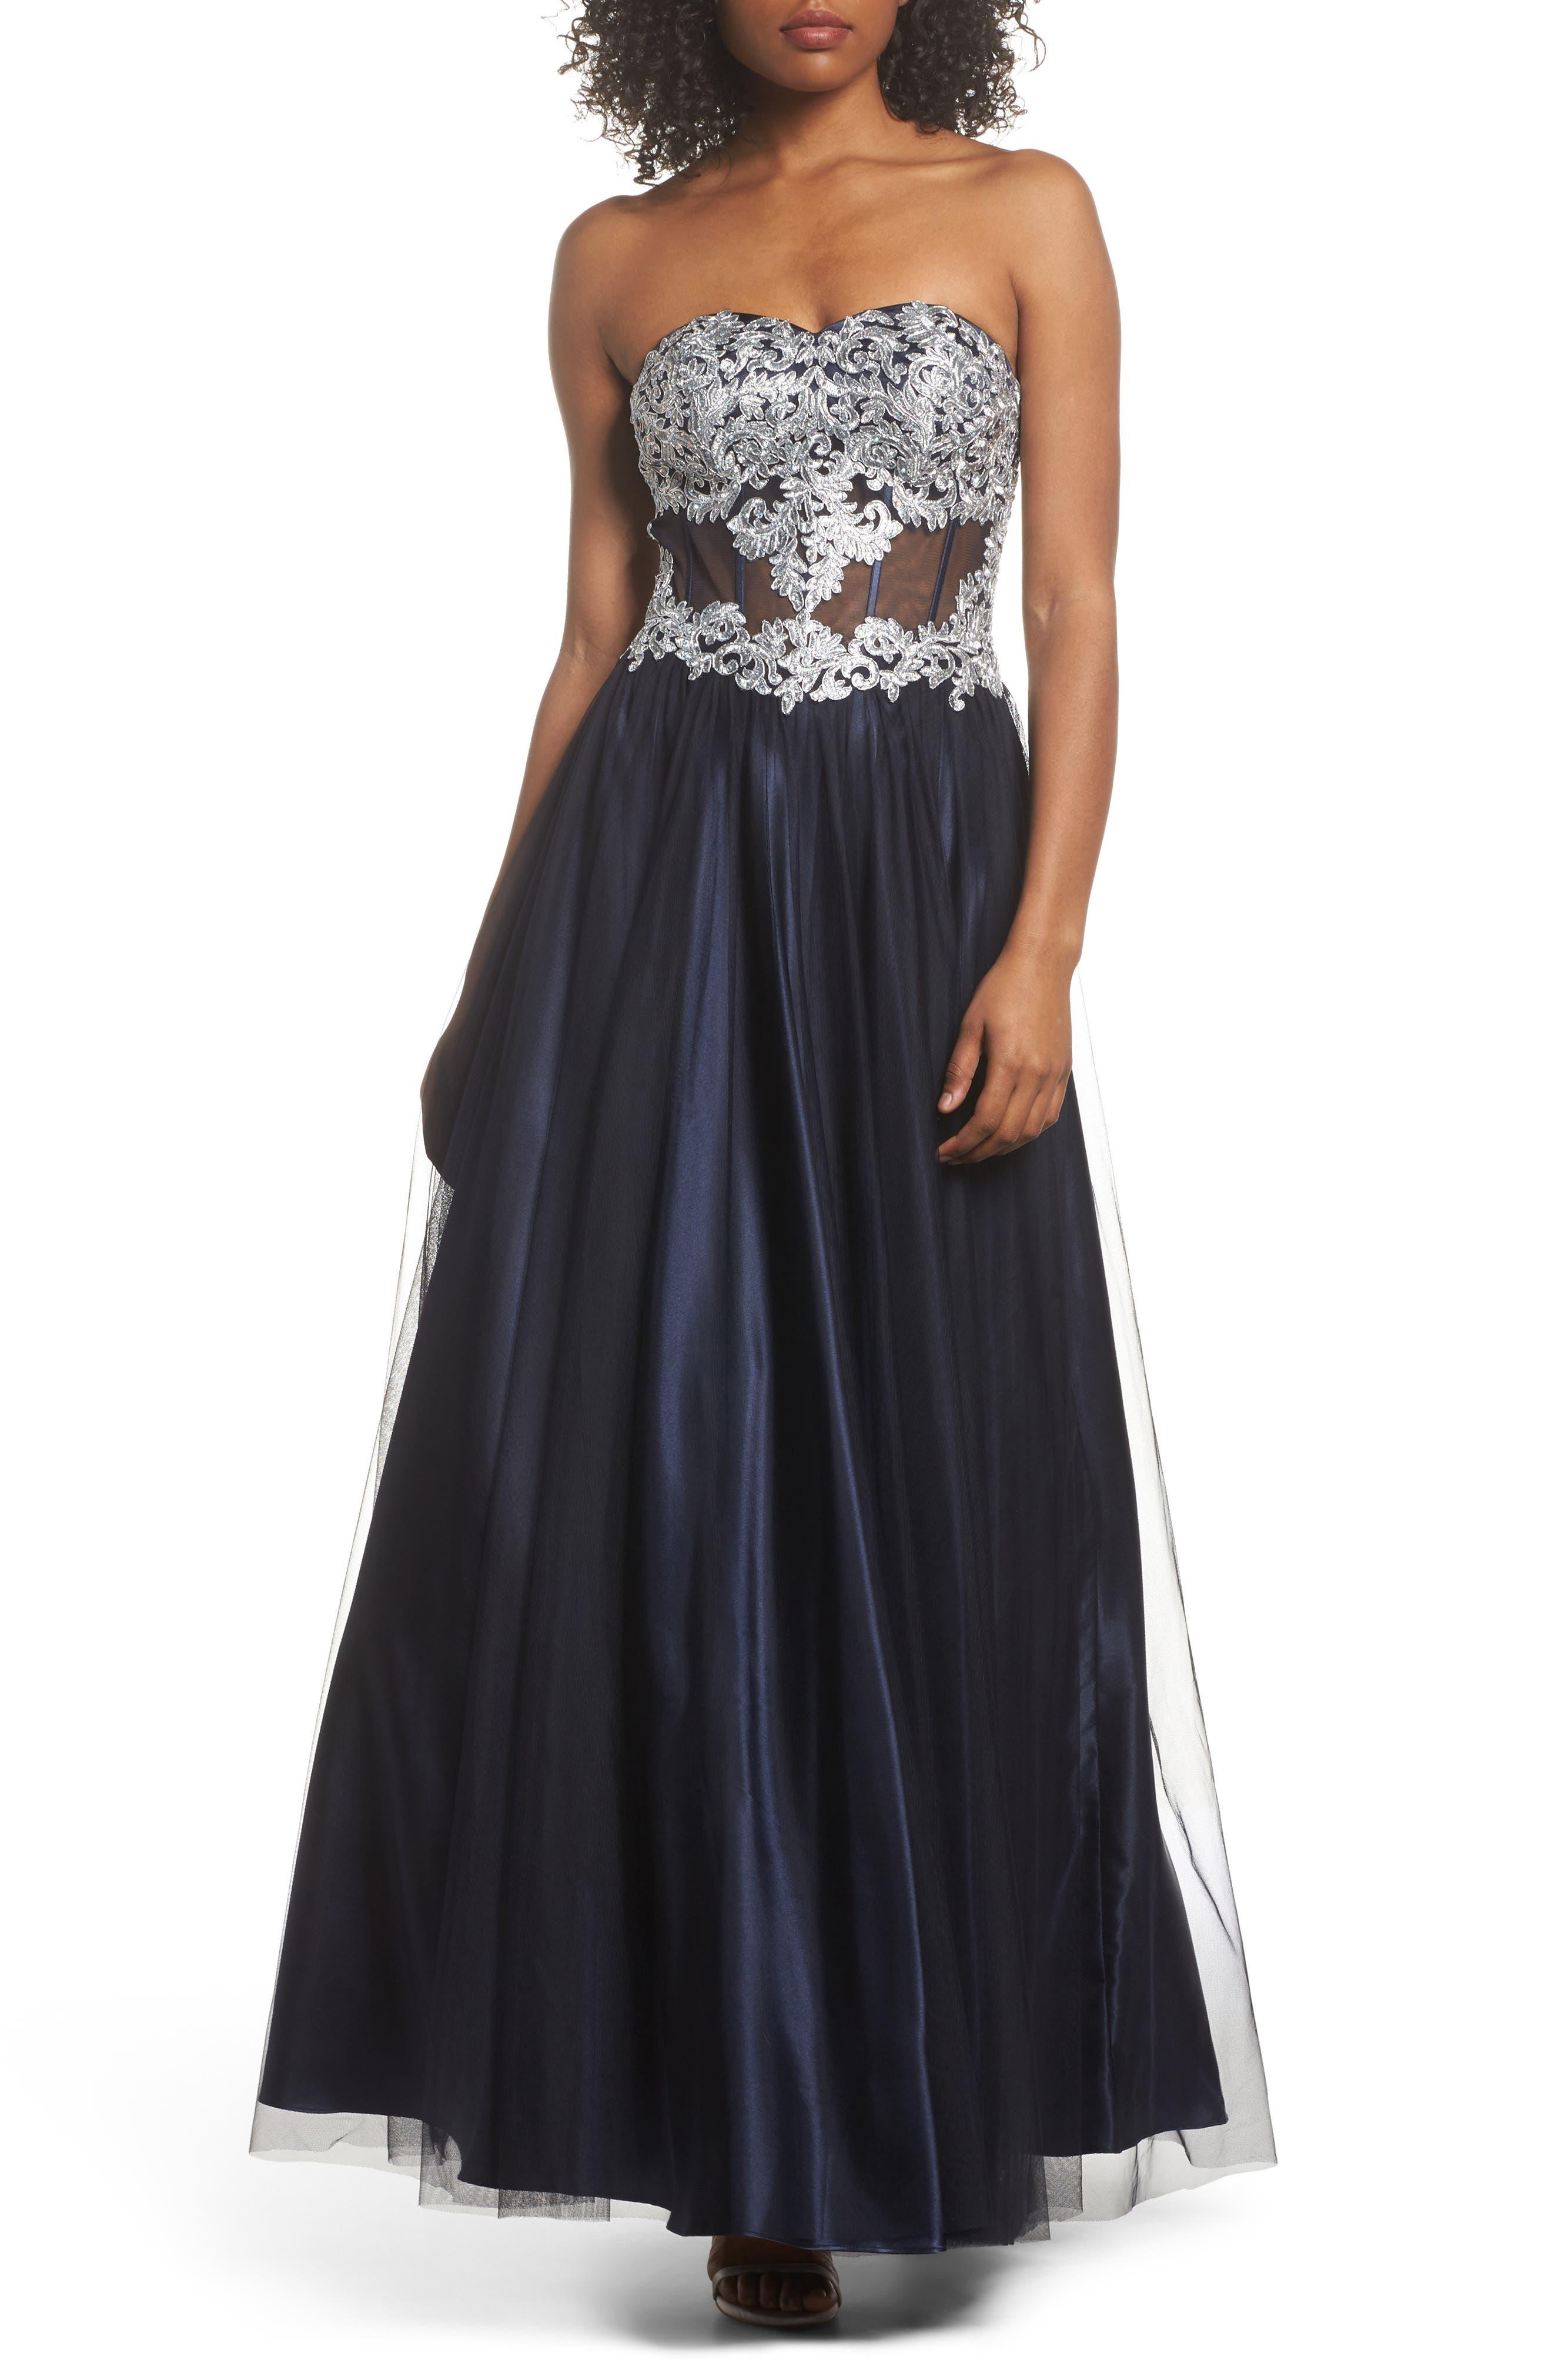 Embellished Corset Ballgown,                             Main thumbnail 1, color,                             Navy/ Silver